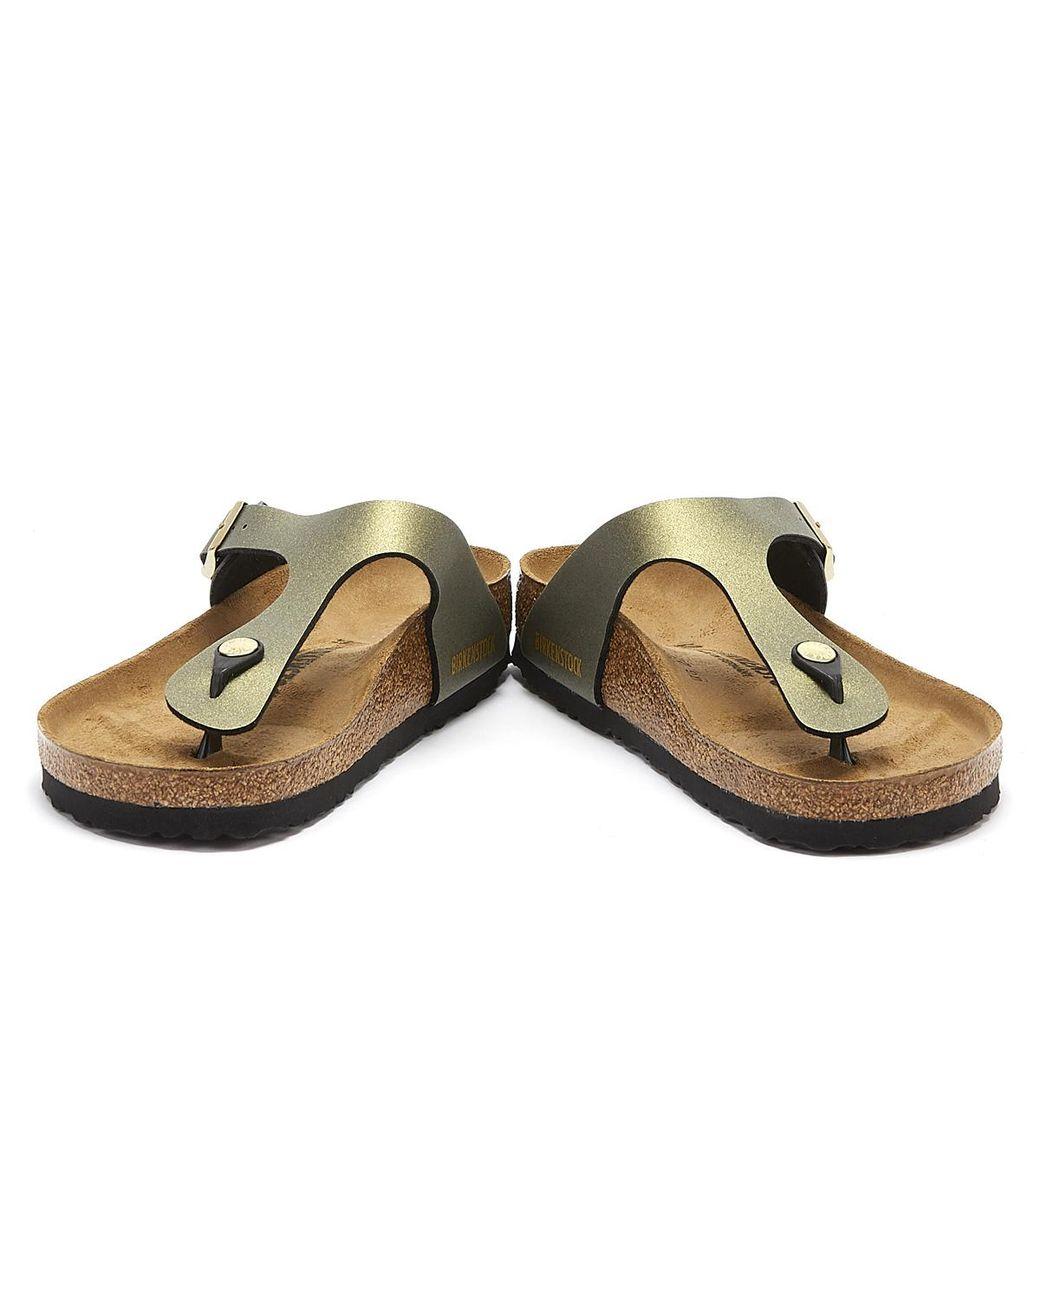 Roxy Bermuda Sandals Gold//Estate Blue Roxy Women/'s Shoes Sandals /& Beach Shoes